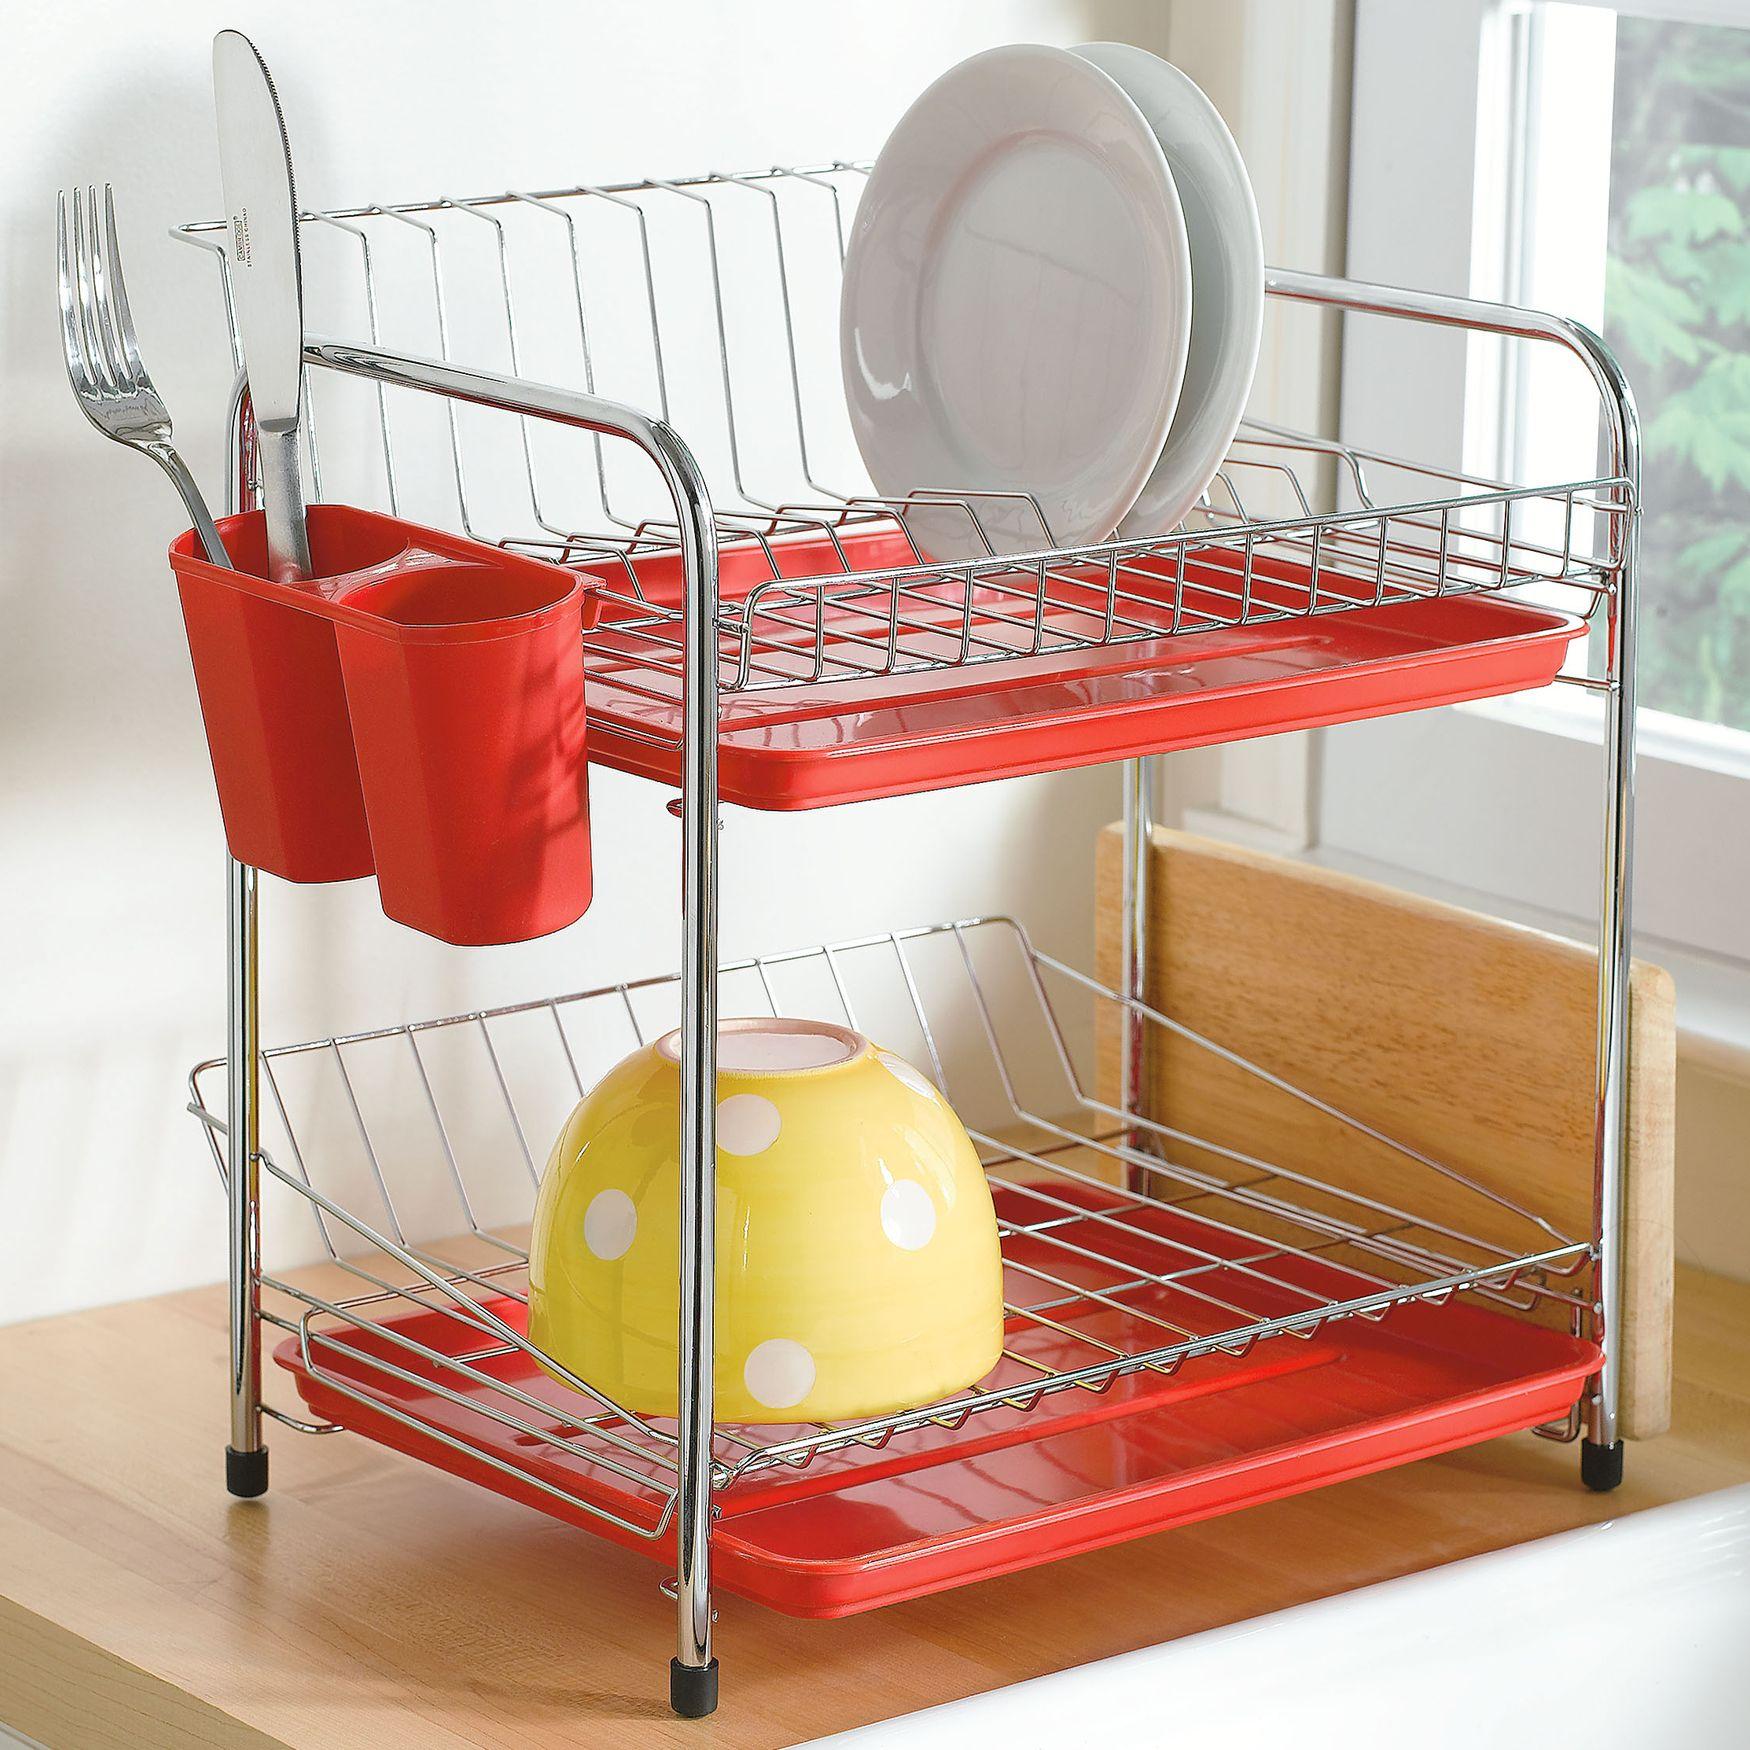 Compact Space Saving 2 Tier Dish Drying Rack 187 H O M E